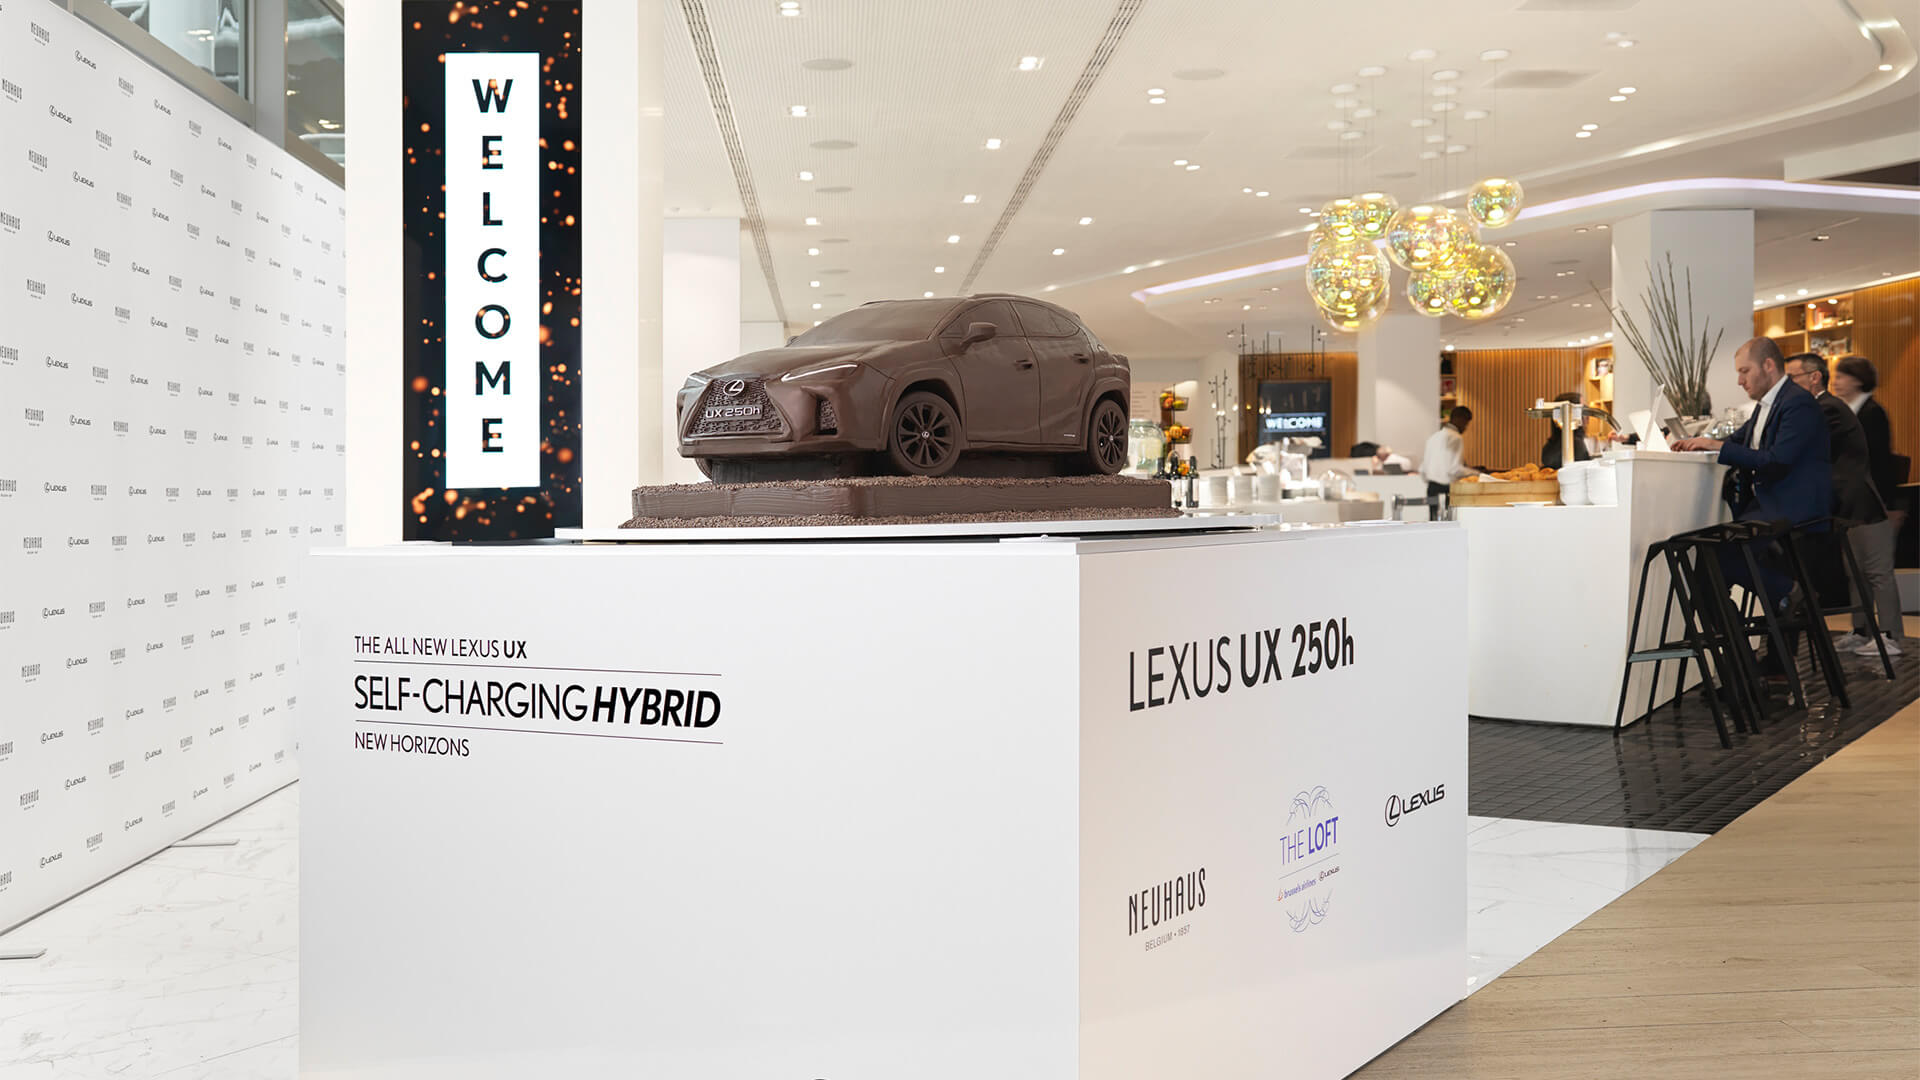 2019 lexus lounge UX Chocolate Car 1920x1080 03